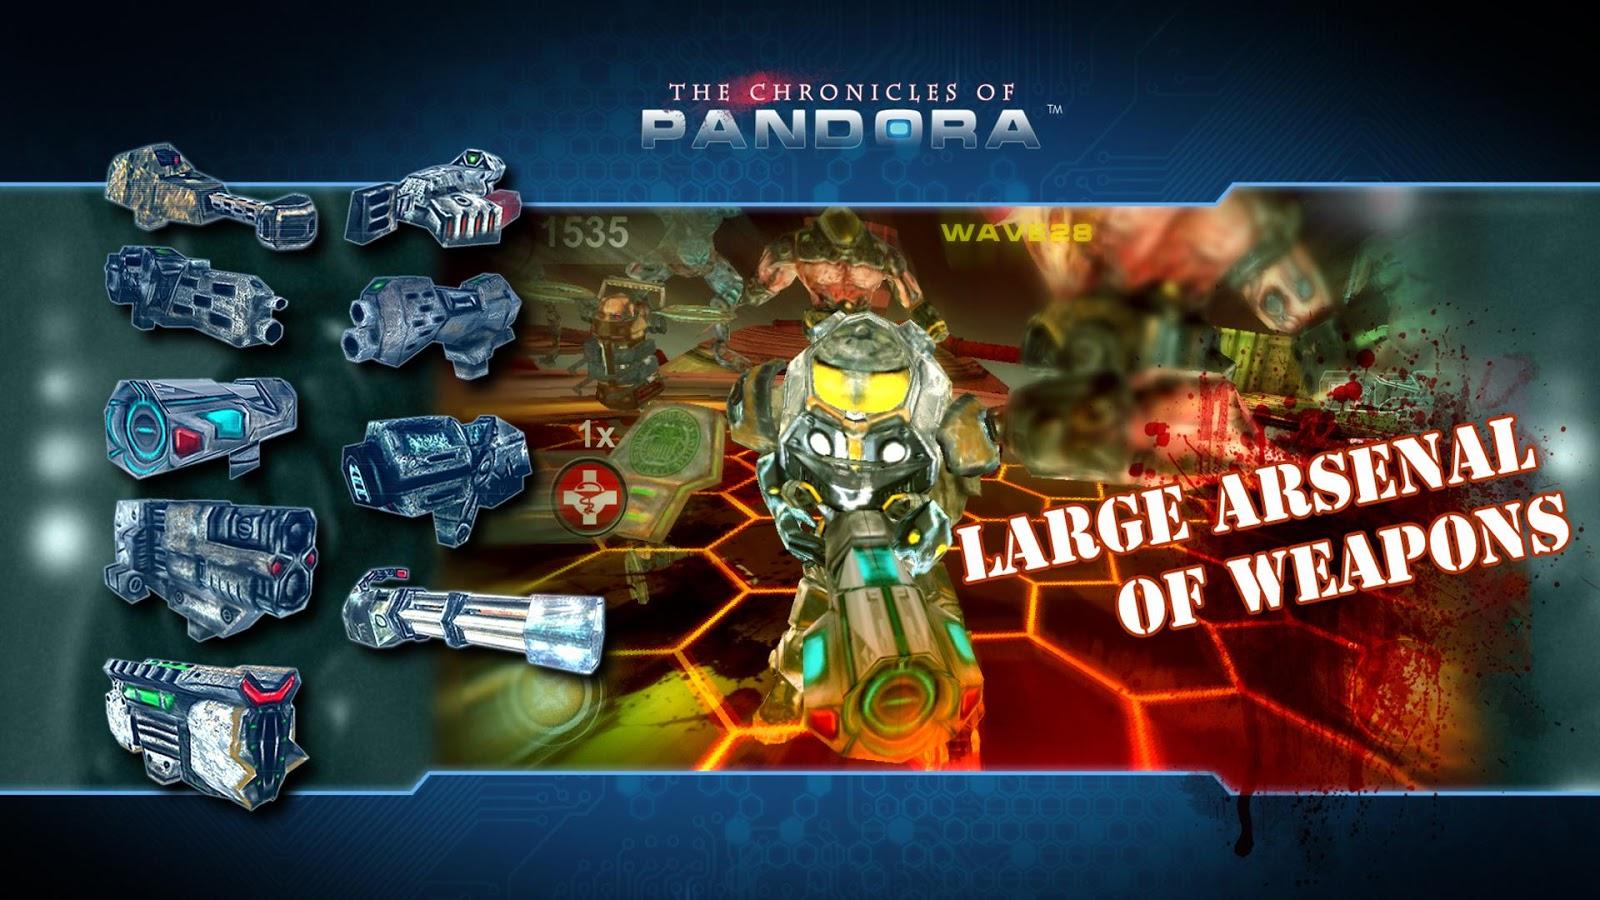 The-Chronicles-of-Pandora 25